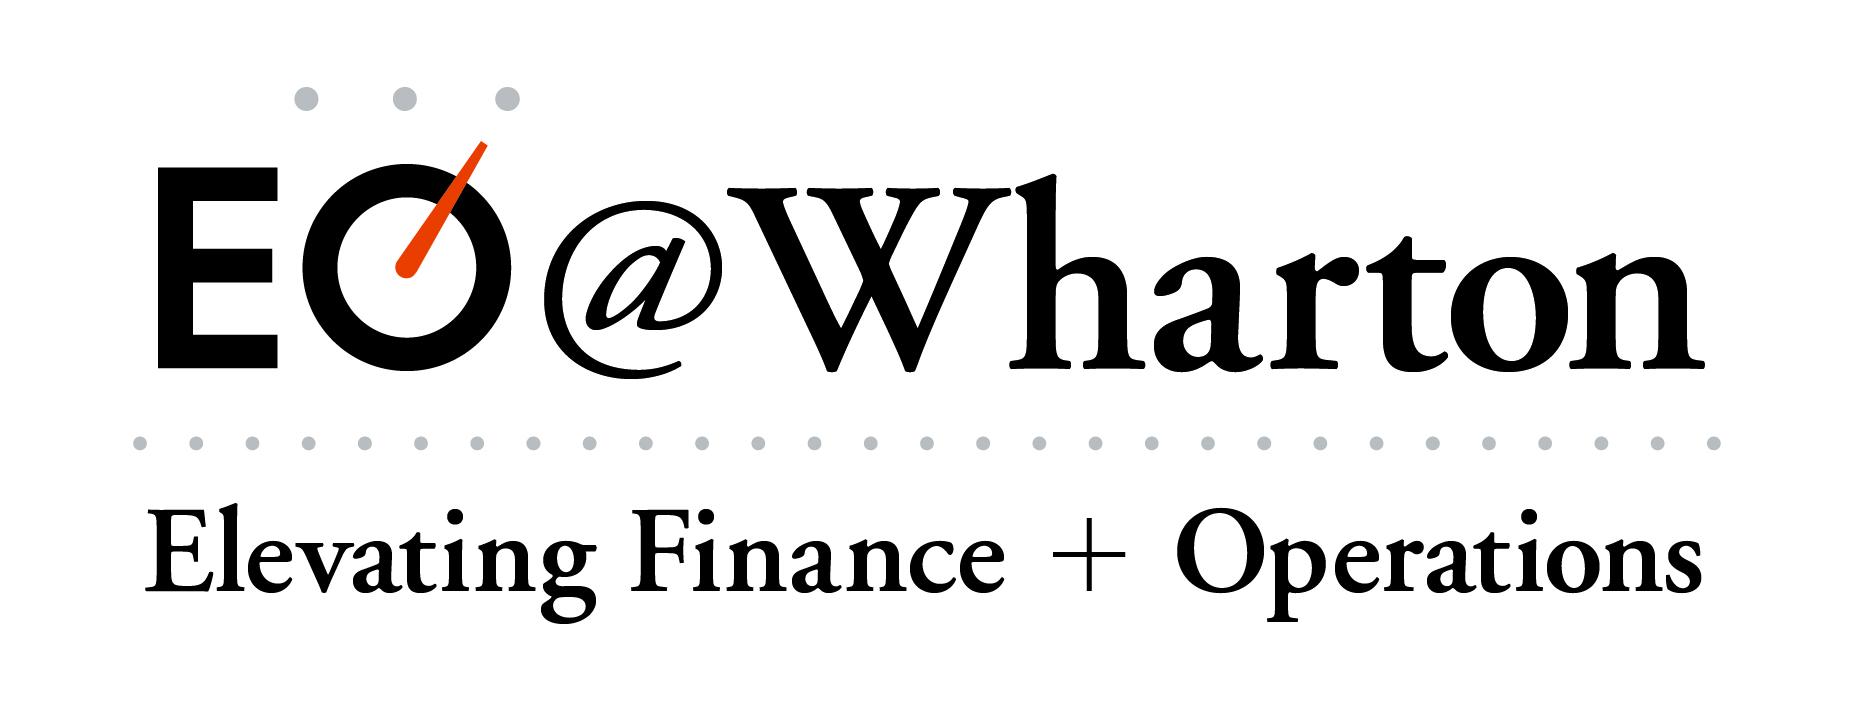 2018 EO@Wharton: Elevating Finance + Operations